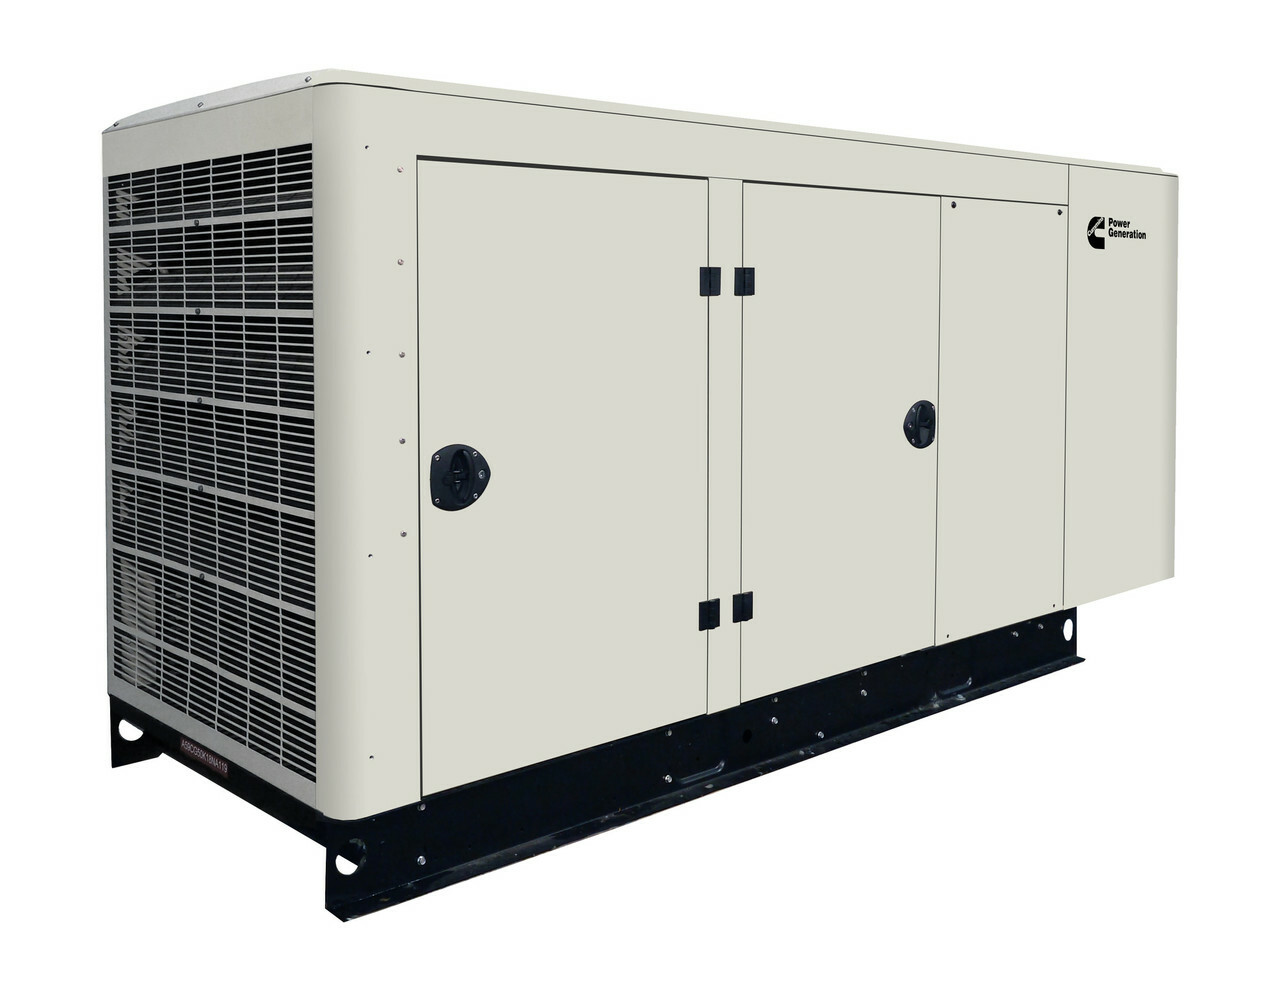 cummins rs50 quiet connect series 50kw generator [ 1280 x 989 Pixel ]